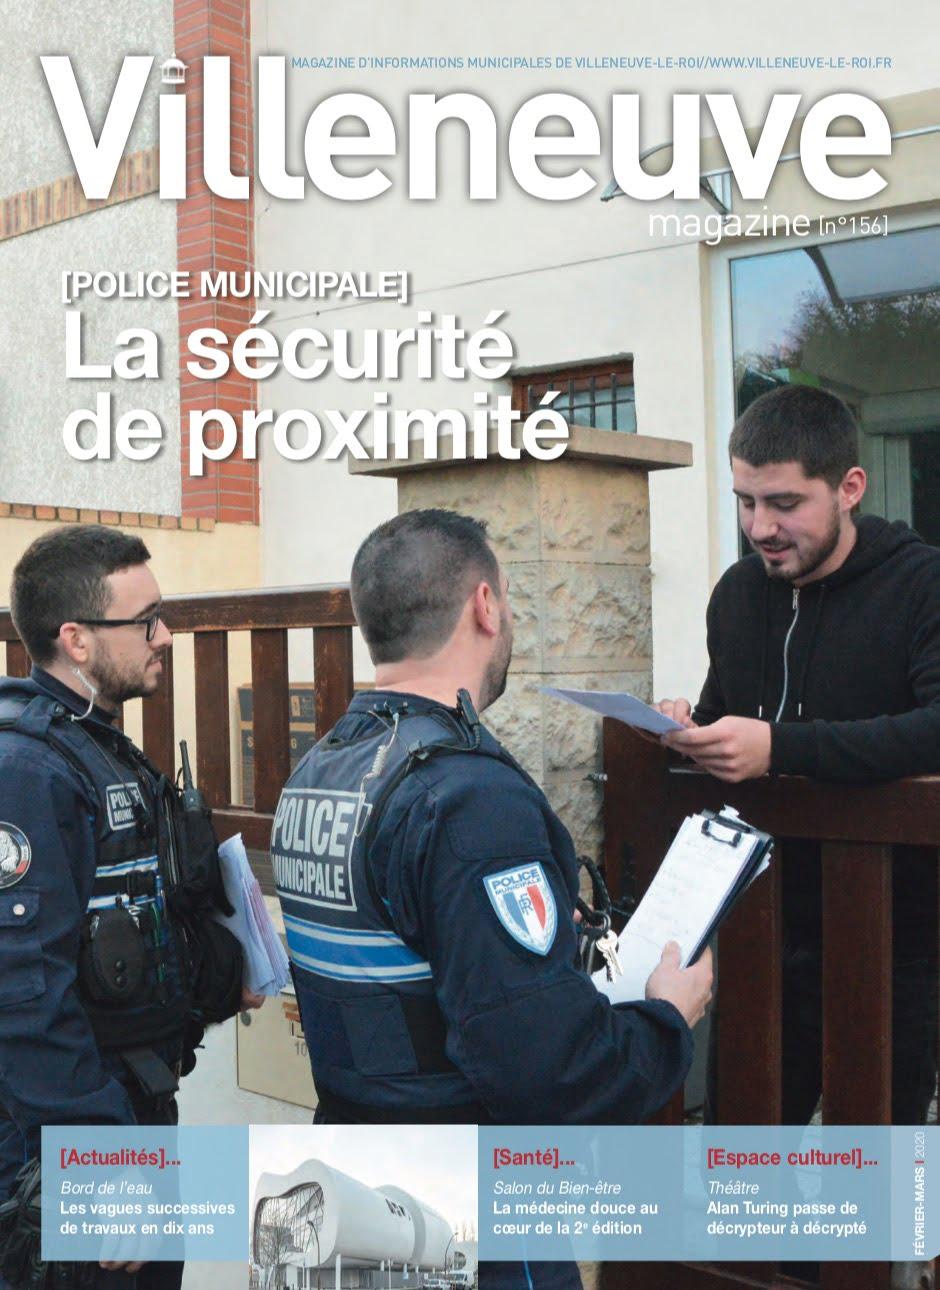 Villeneuve magazine n°156